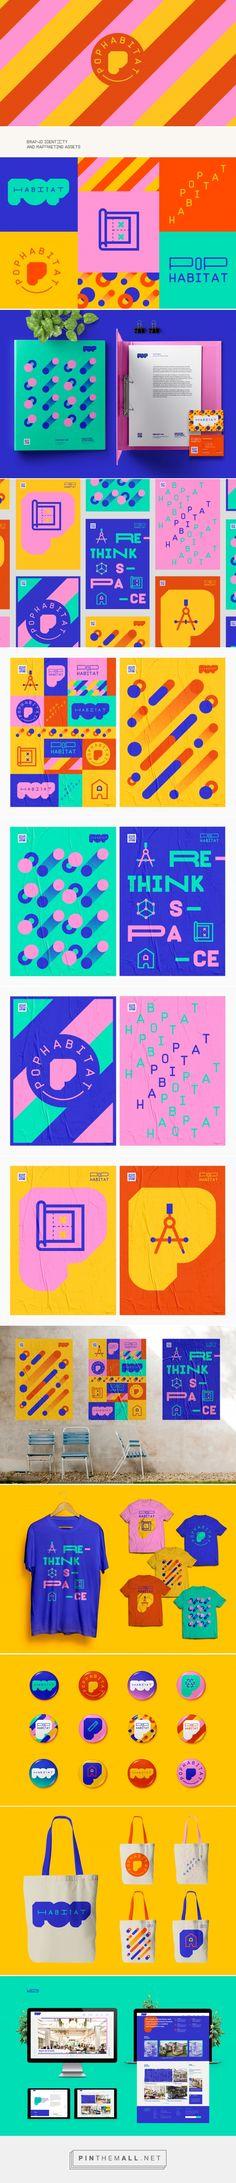 Pop Habitat Branding by Will Nunes Studio | Fivestar Branding Agency – Design and Branding Agency & Curated Inspiration Gallery #design #designinspiration #designlovers #branding #brand #brandidentity